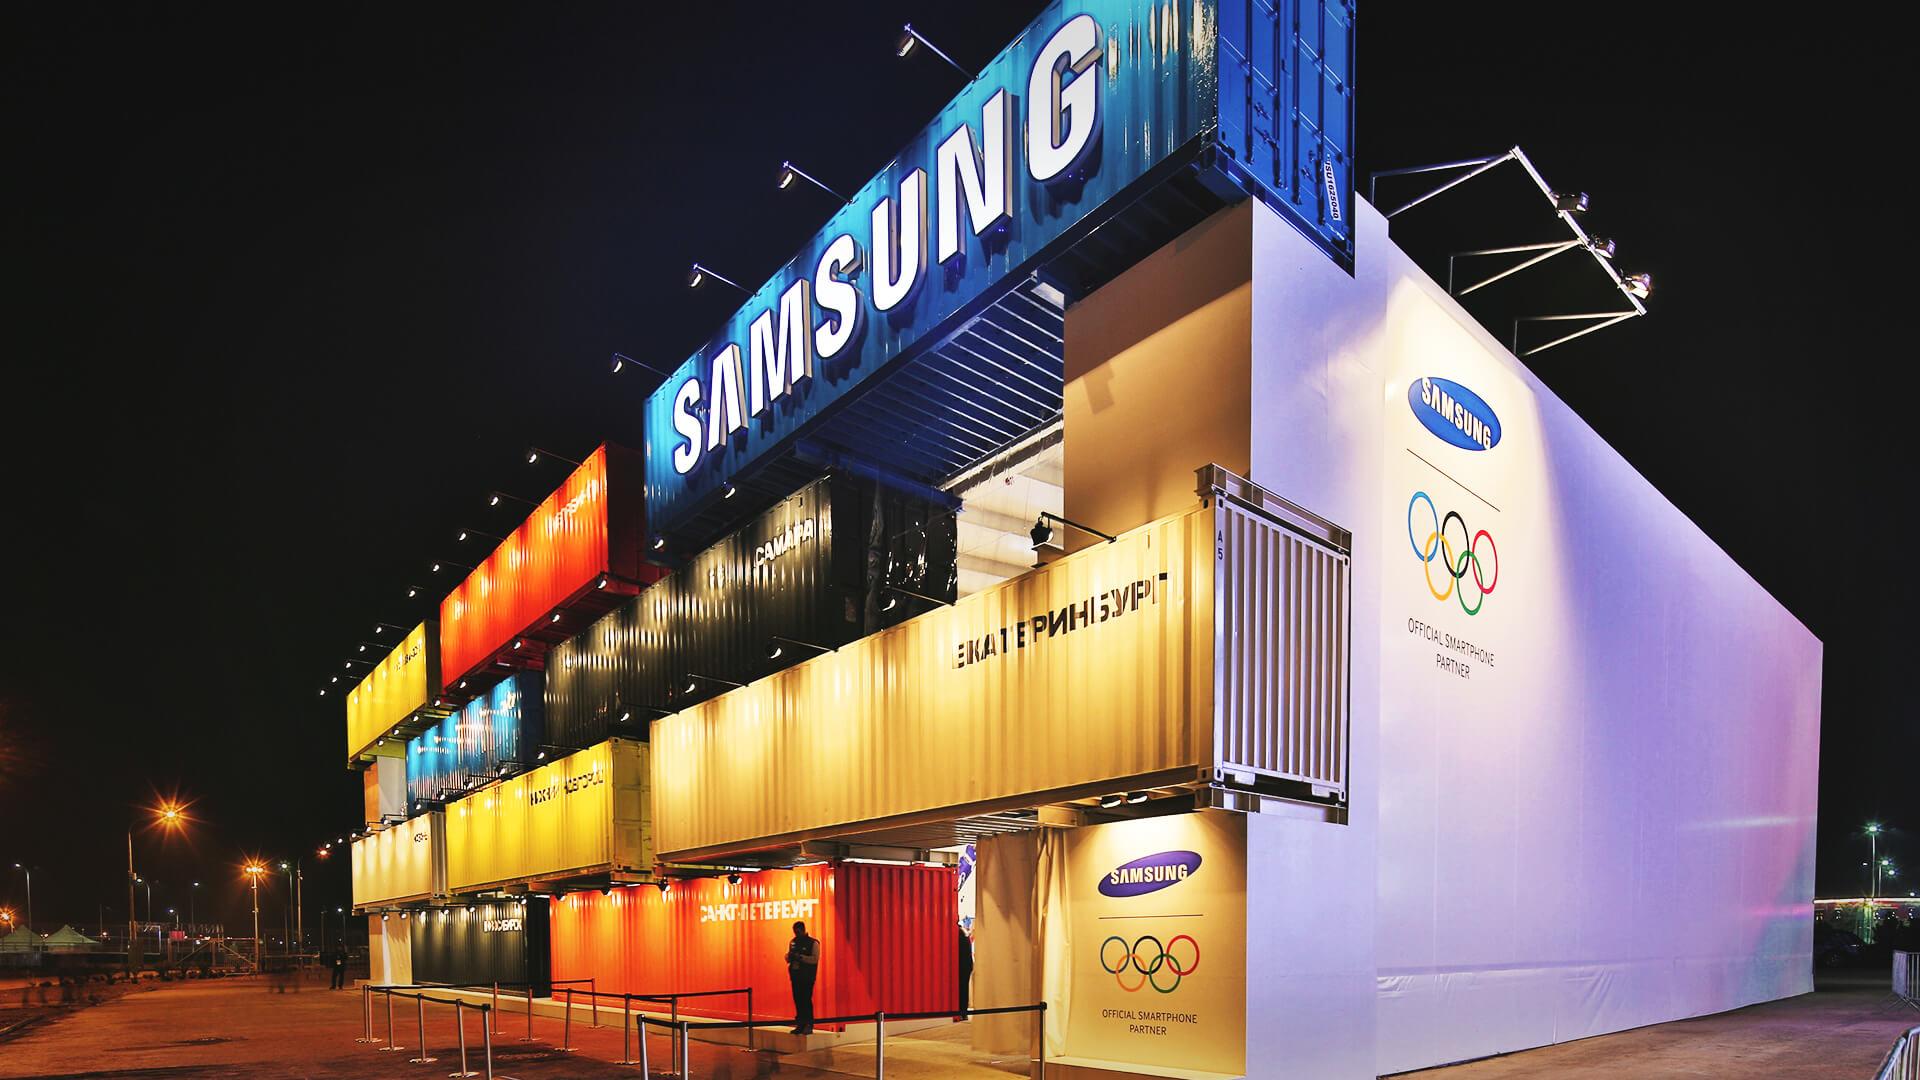 Samsung GALAXY Studio, Sochi